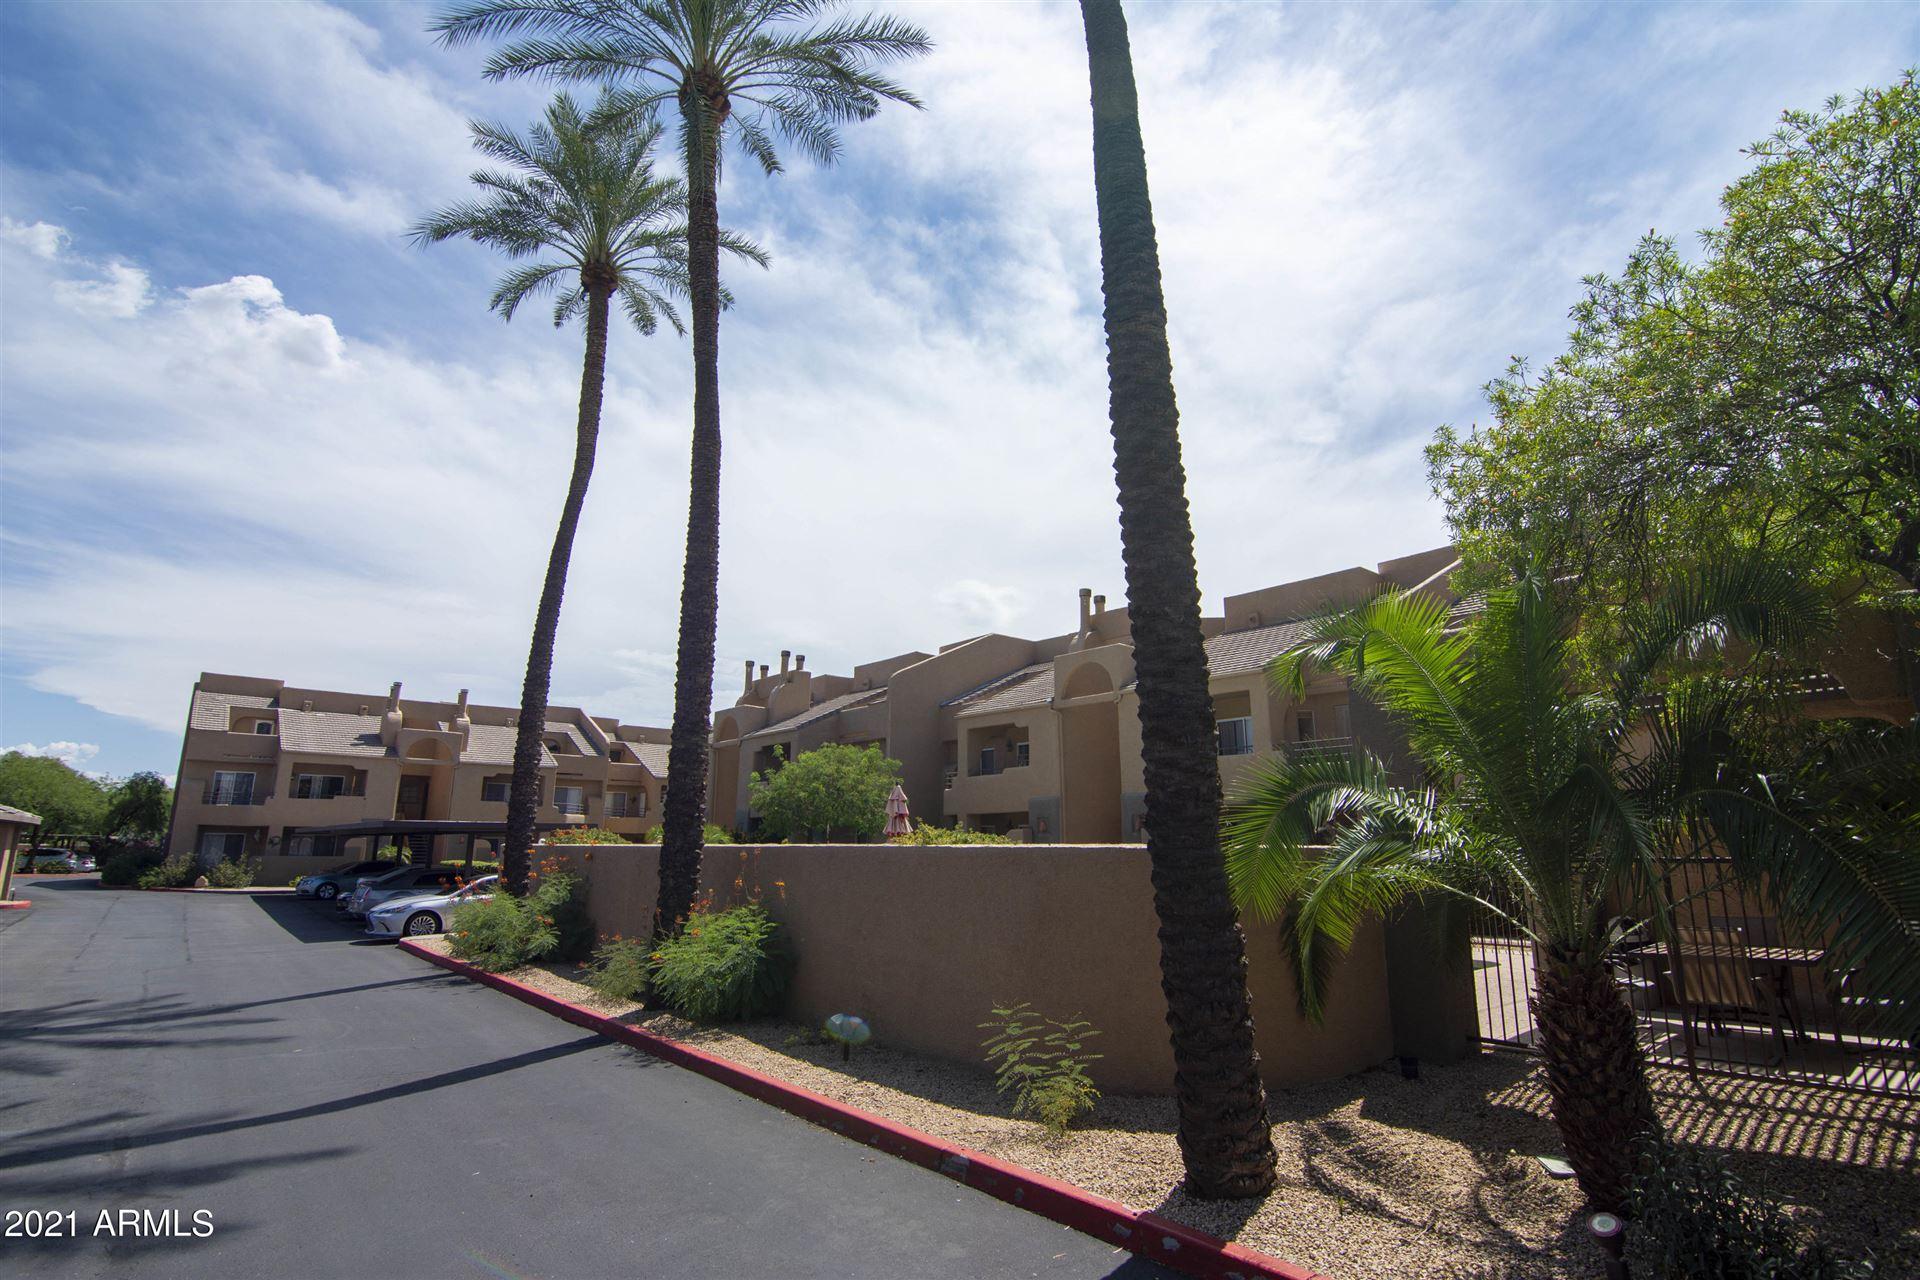 Photo of 3845 E GREENWAY Road #115, Phoenix, AZ 85032 (MLS # 6268879)